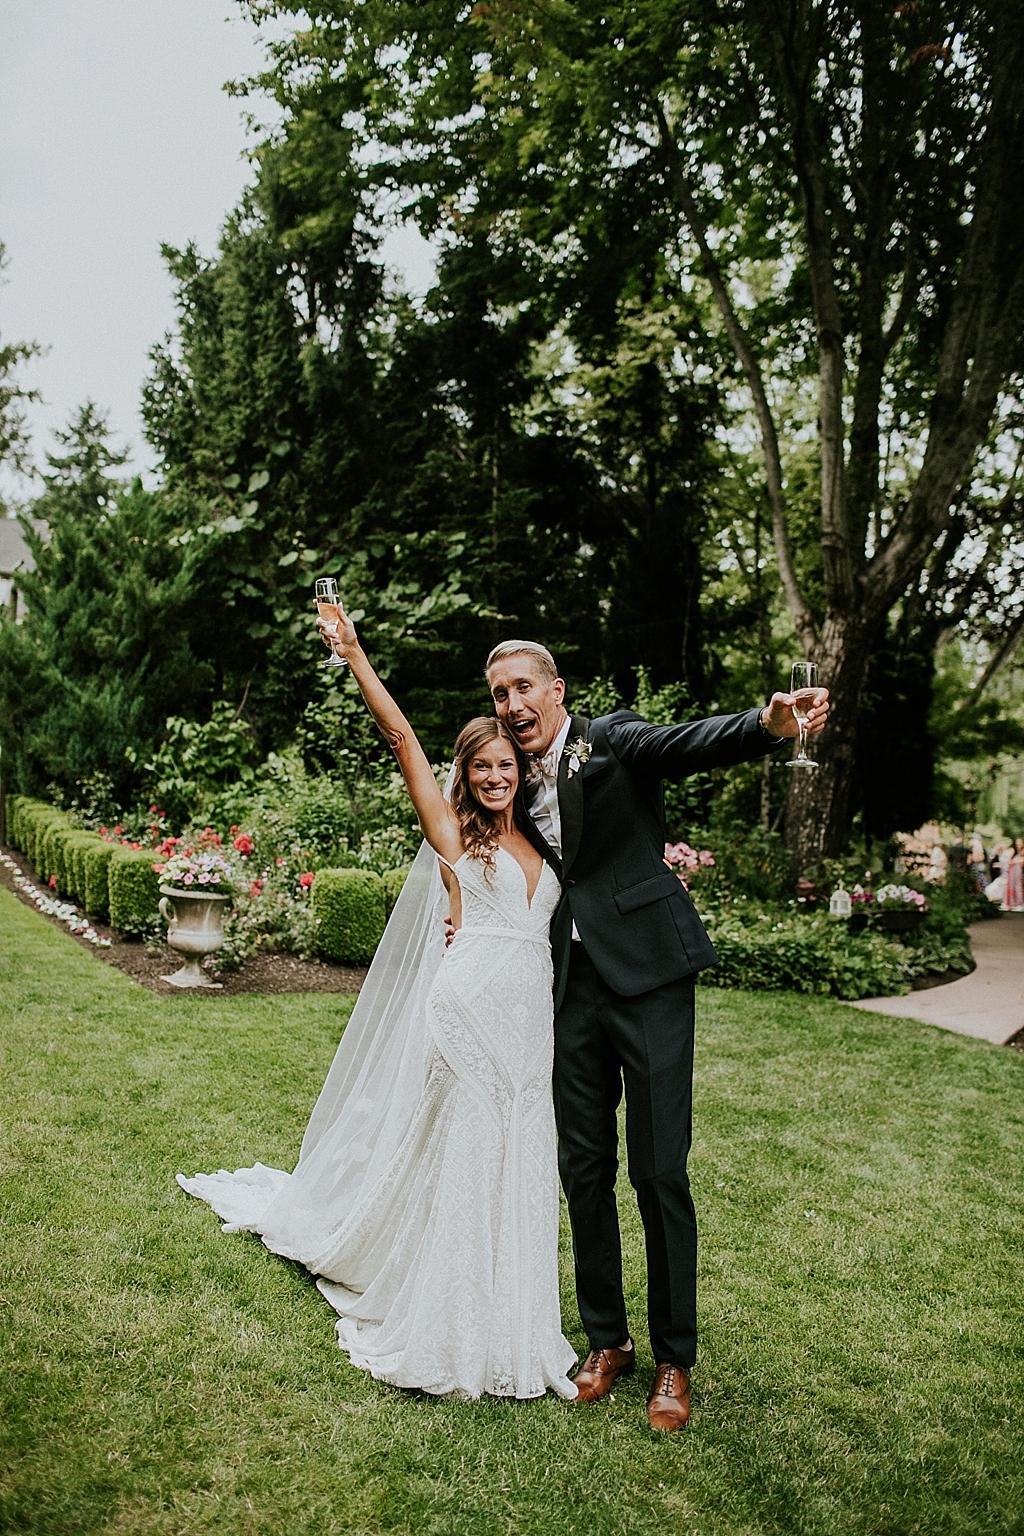 excited wedding couple